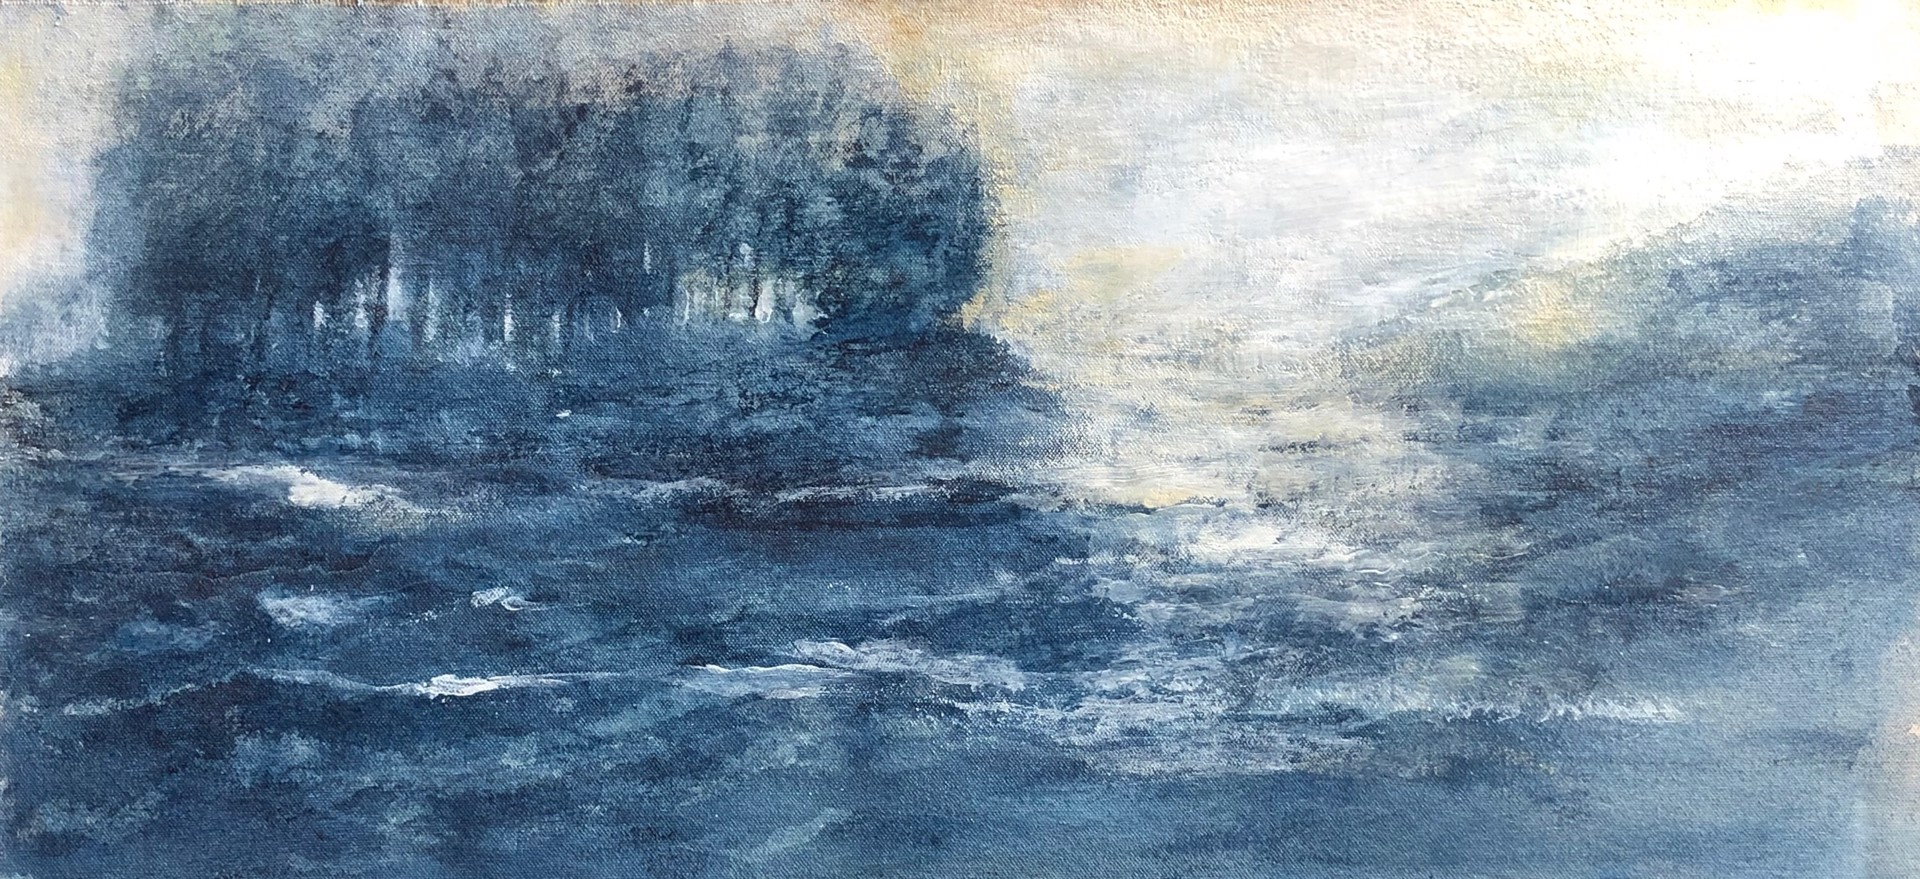 Lake George Apertif by Andrei Petrov